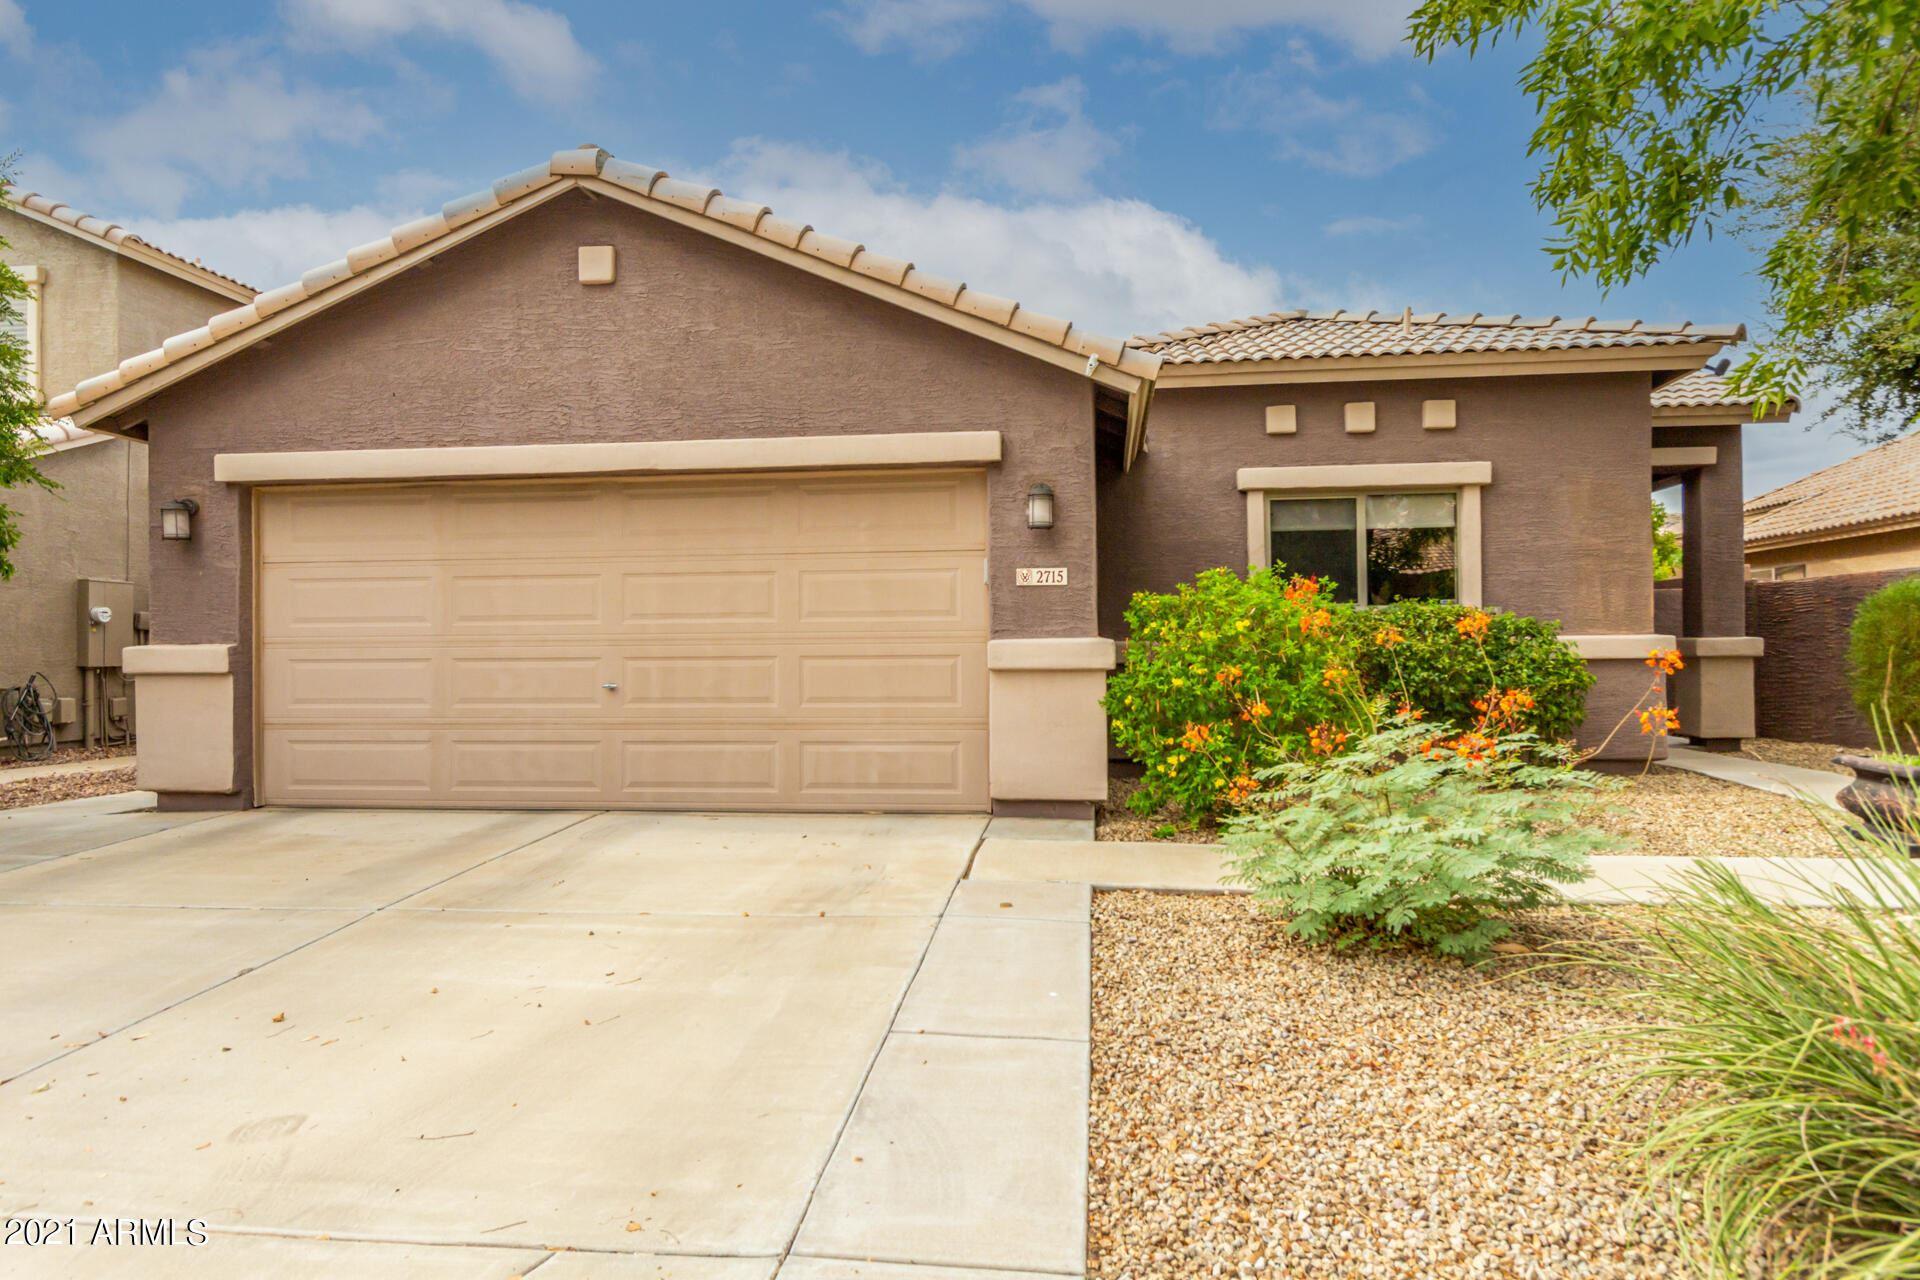 2715 E FAWN Drive, Phoenix, AZ 85042 - MLS#: 6266193